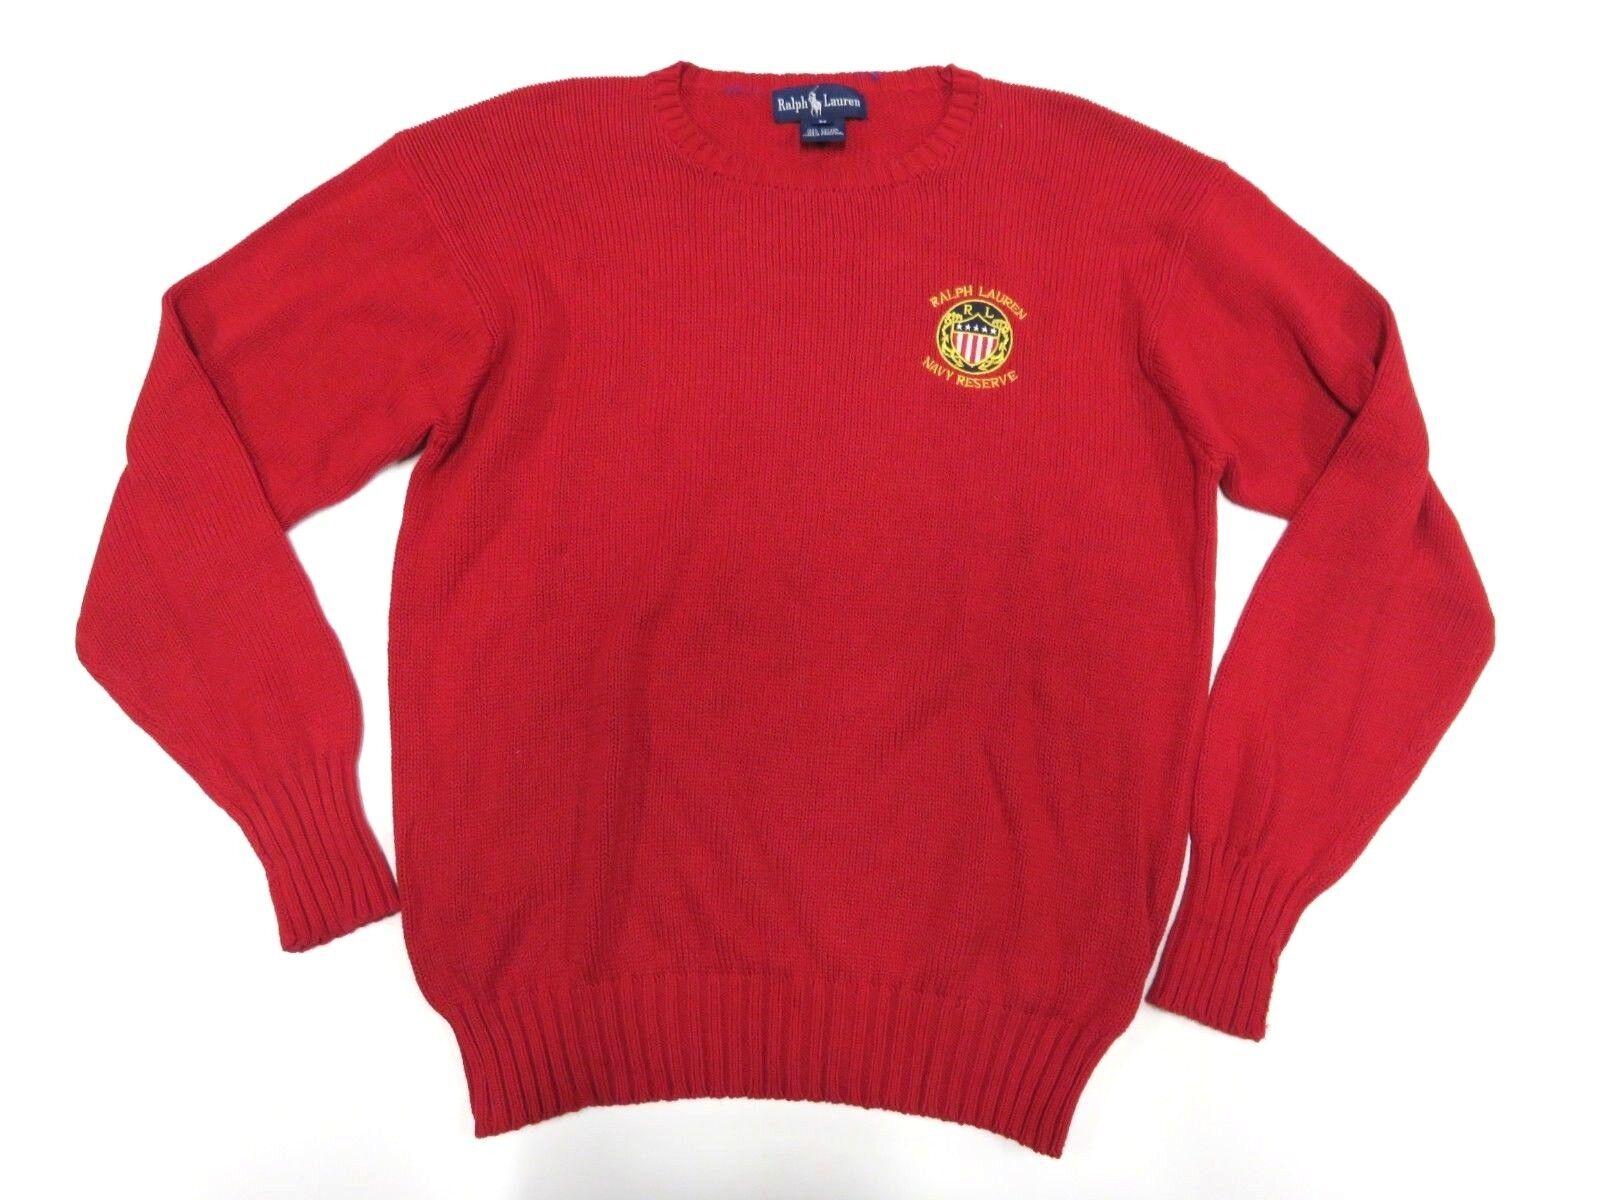 Ralph Lauren Navy Reserve ROT Sweater Adult Größe Medium 100% Cotton